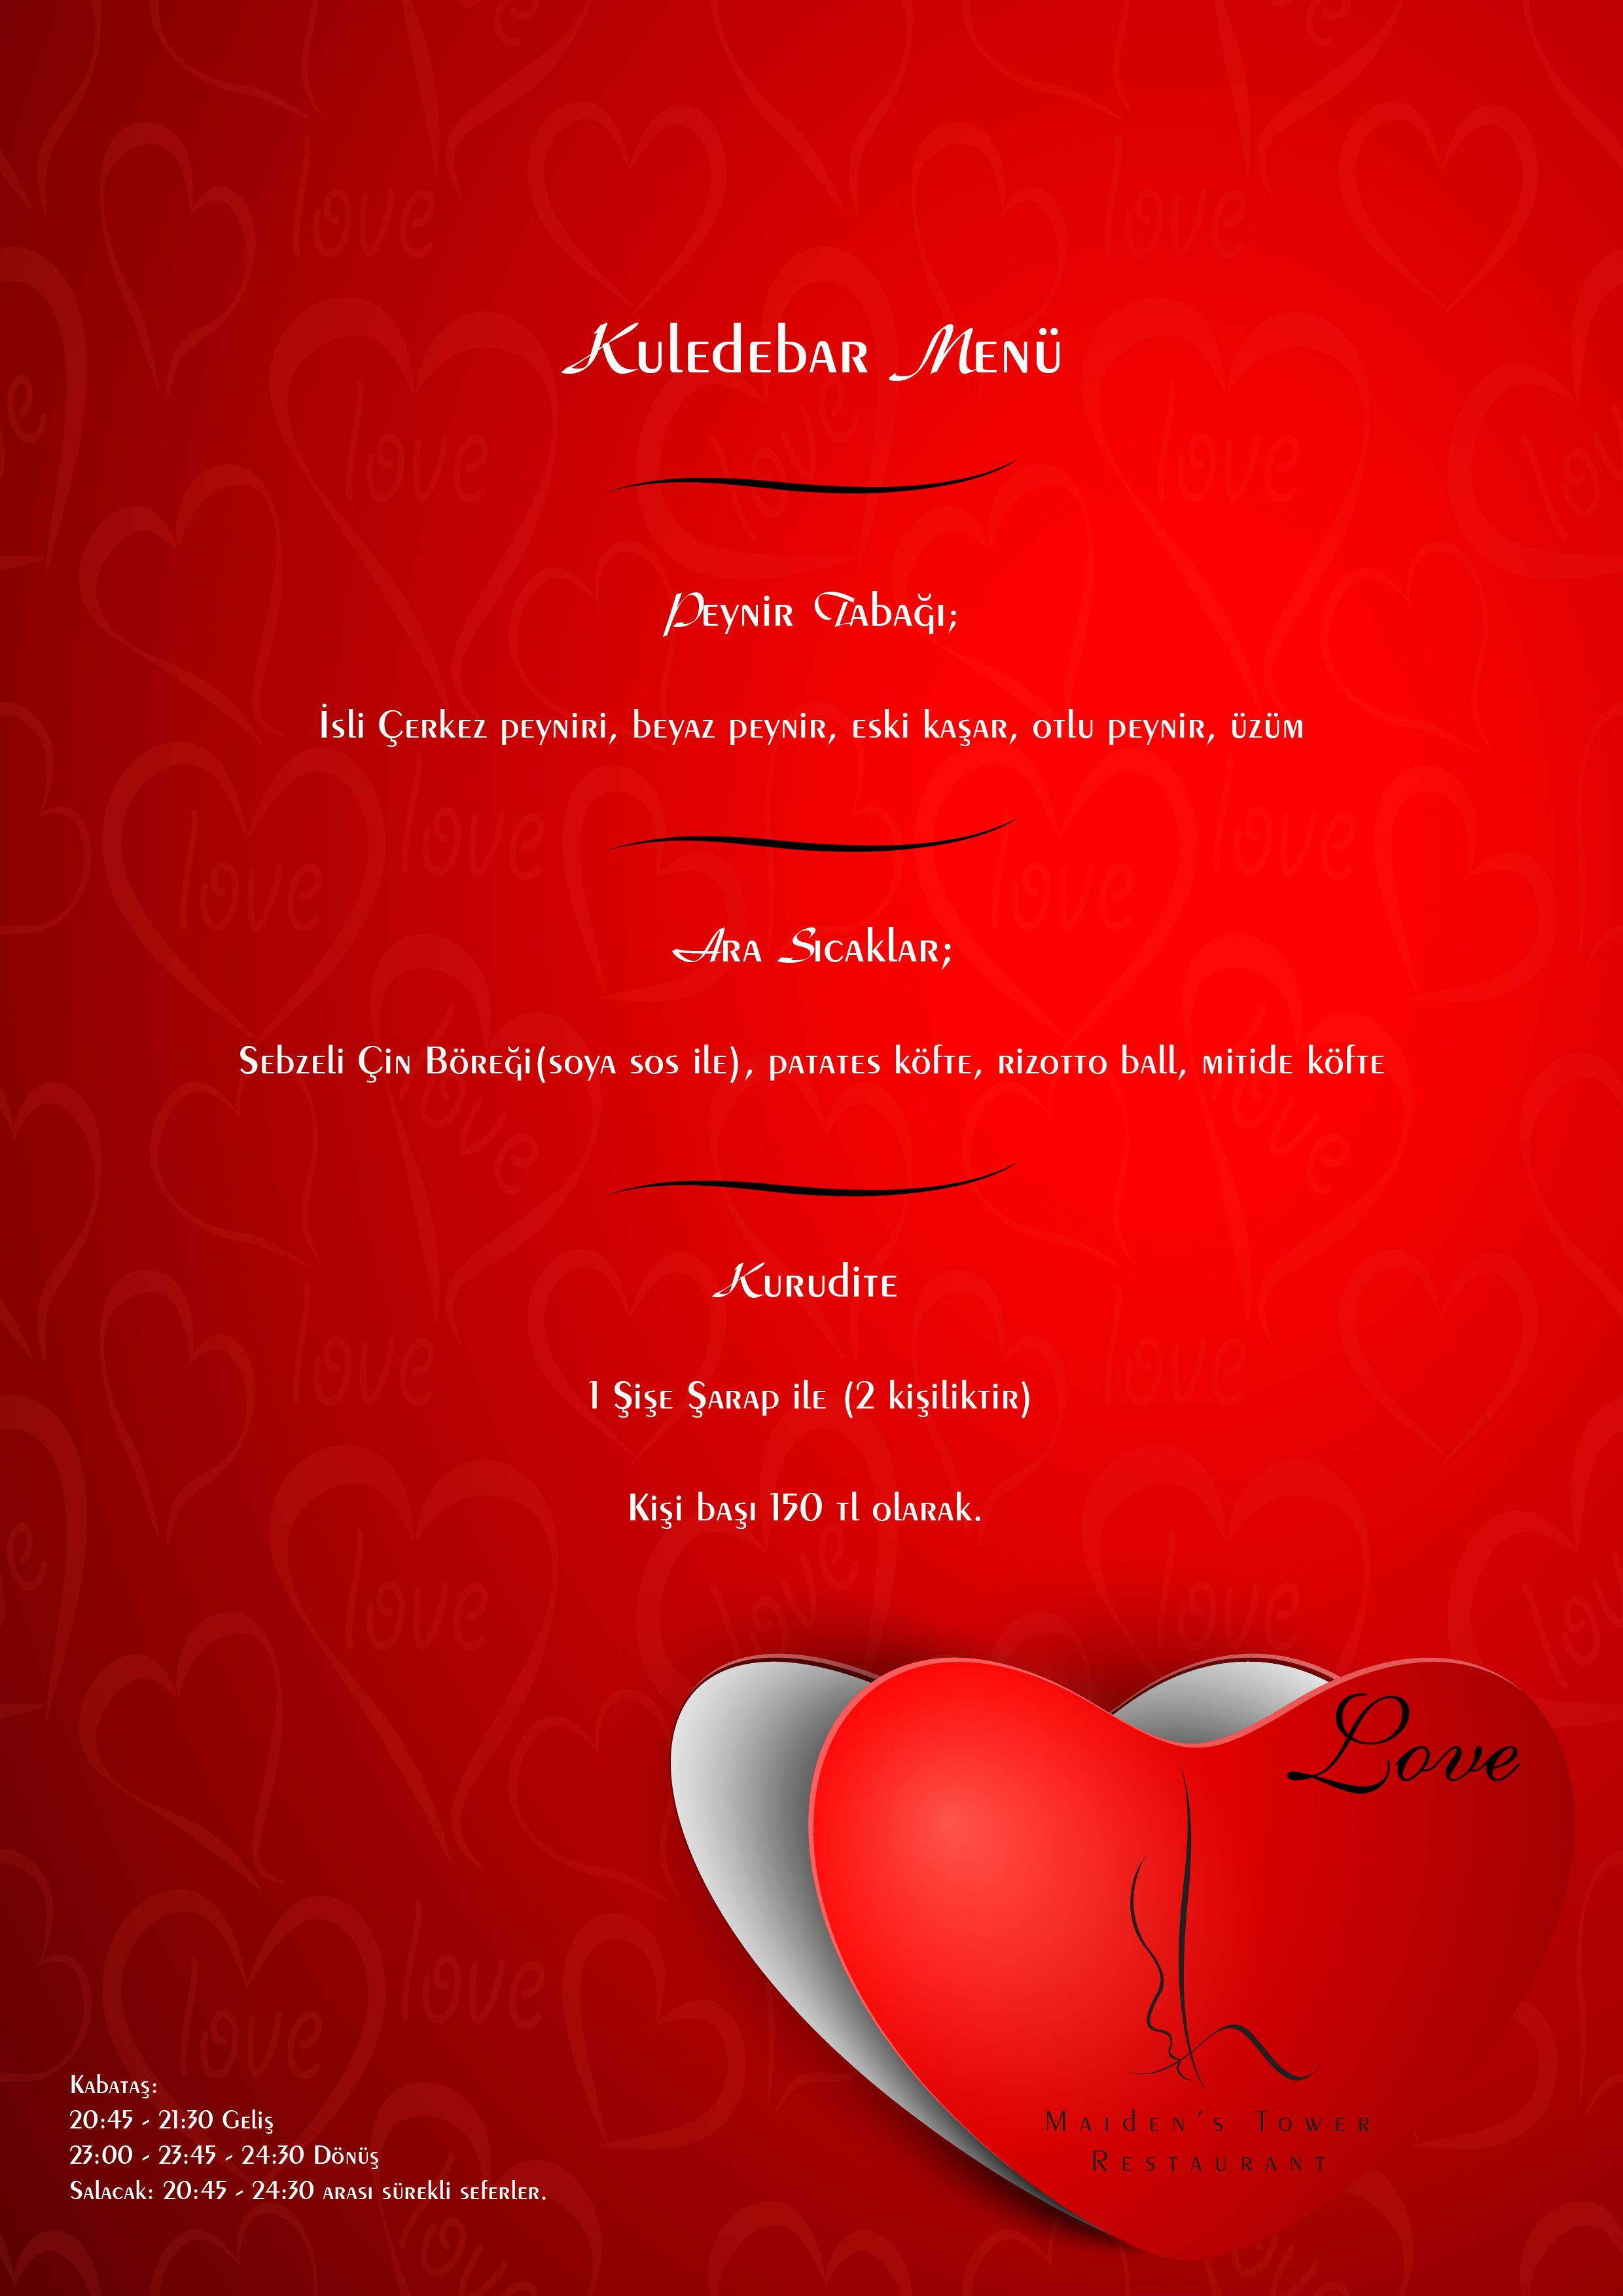 menu background idea bhcc valentine s day menu design menu rh pinterest com